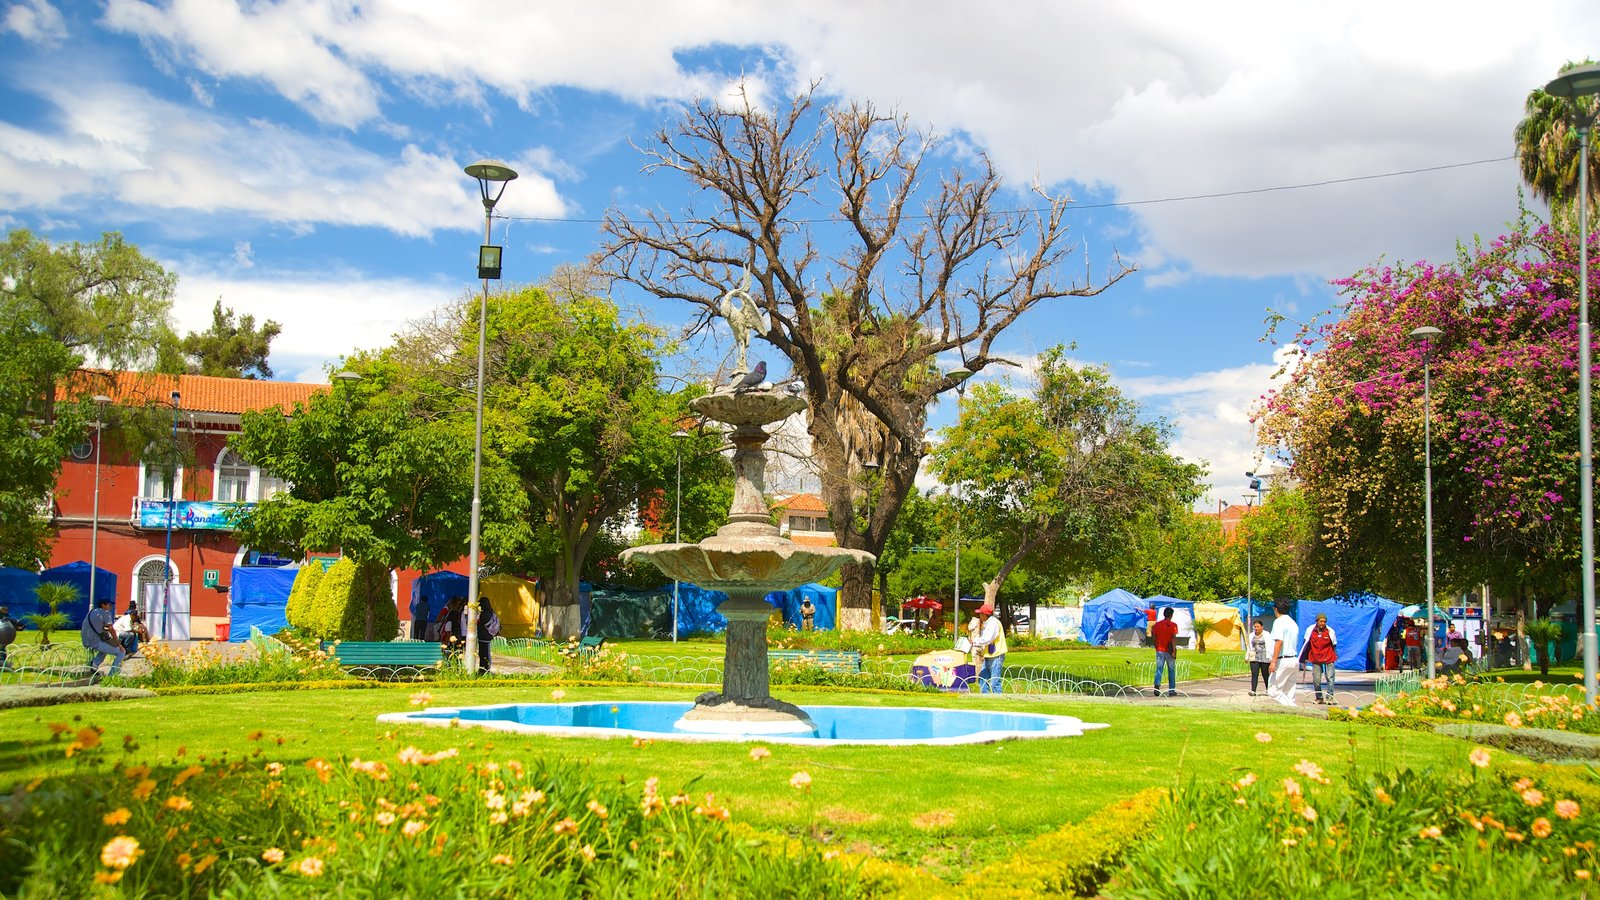 Plaza Colon mostrando um jardim